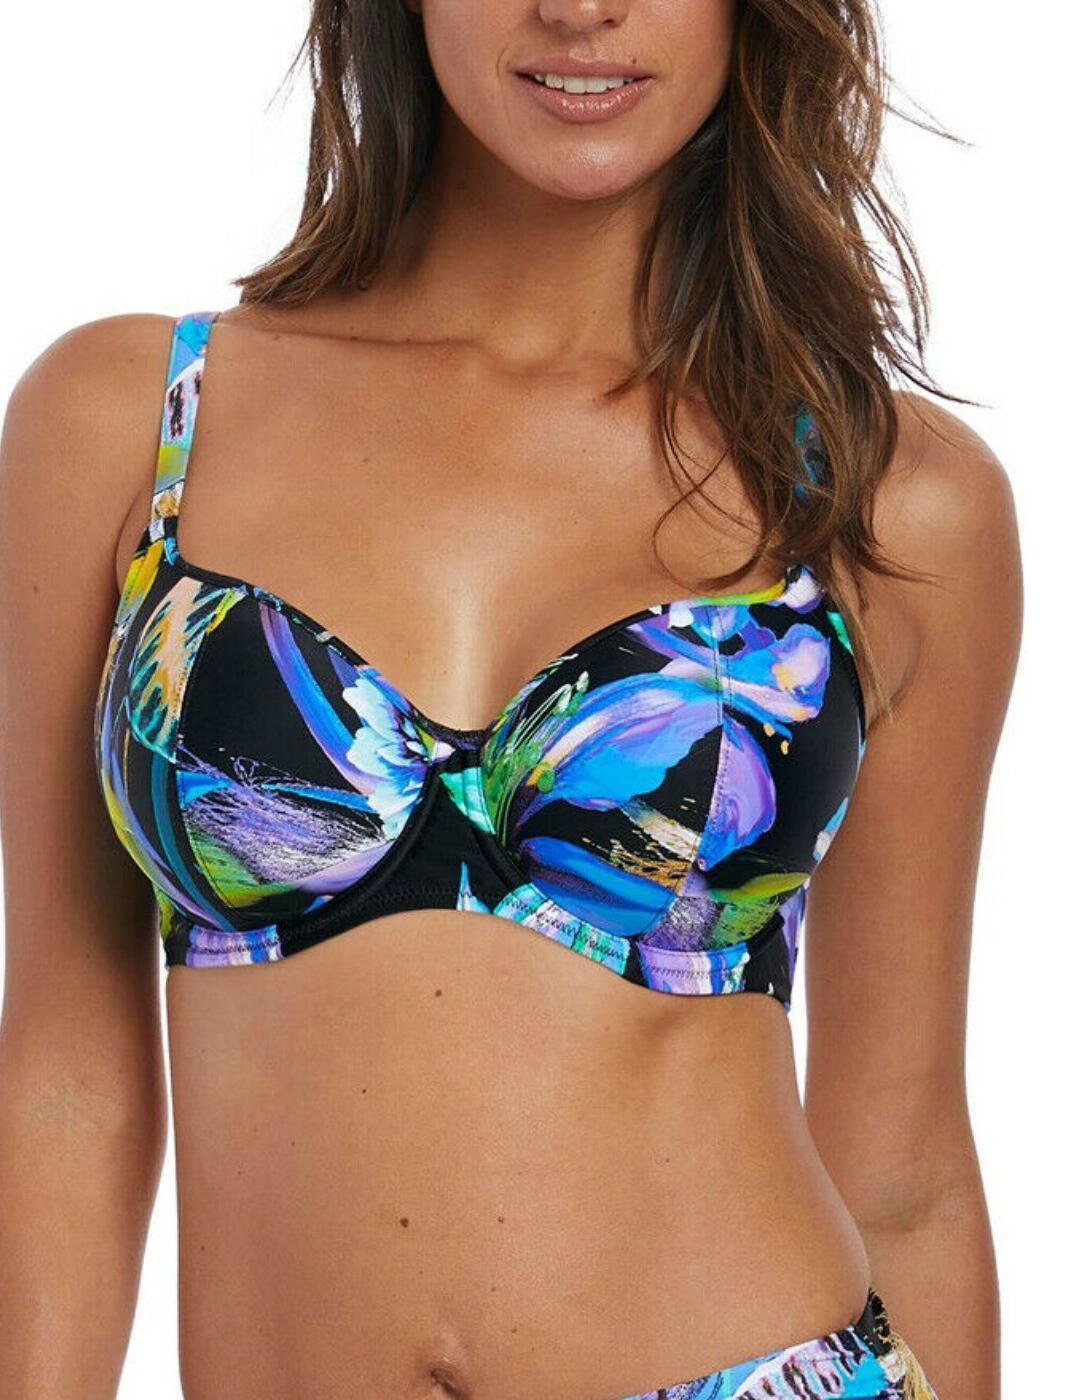 6475 Fantasie Paradise Bay Lightly Padded Bikini Top - 6475 Aqua Multi